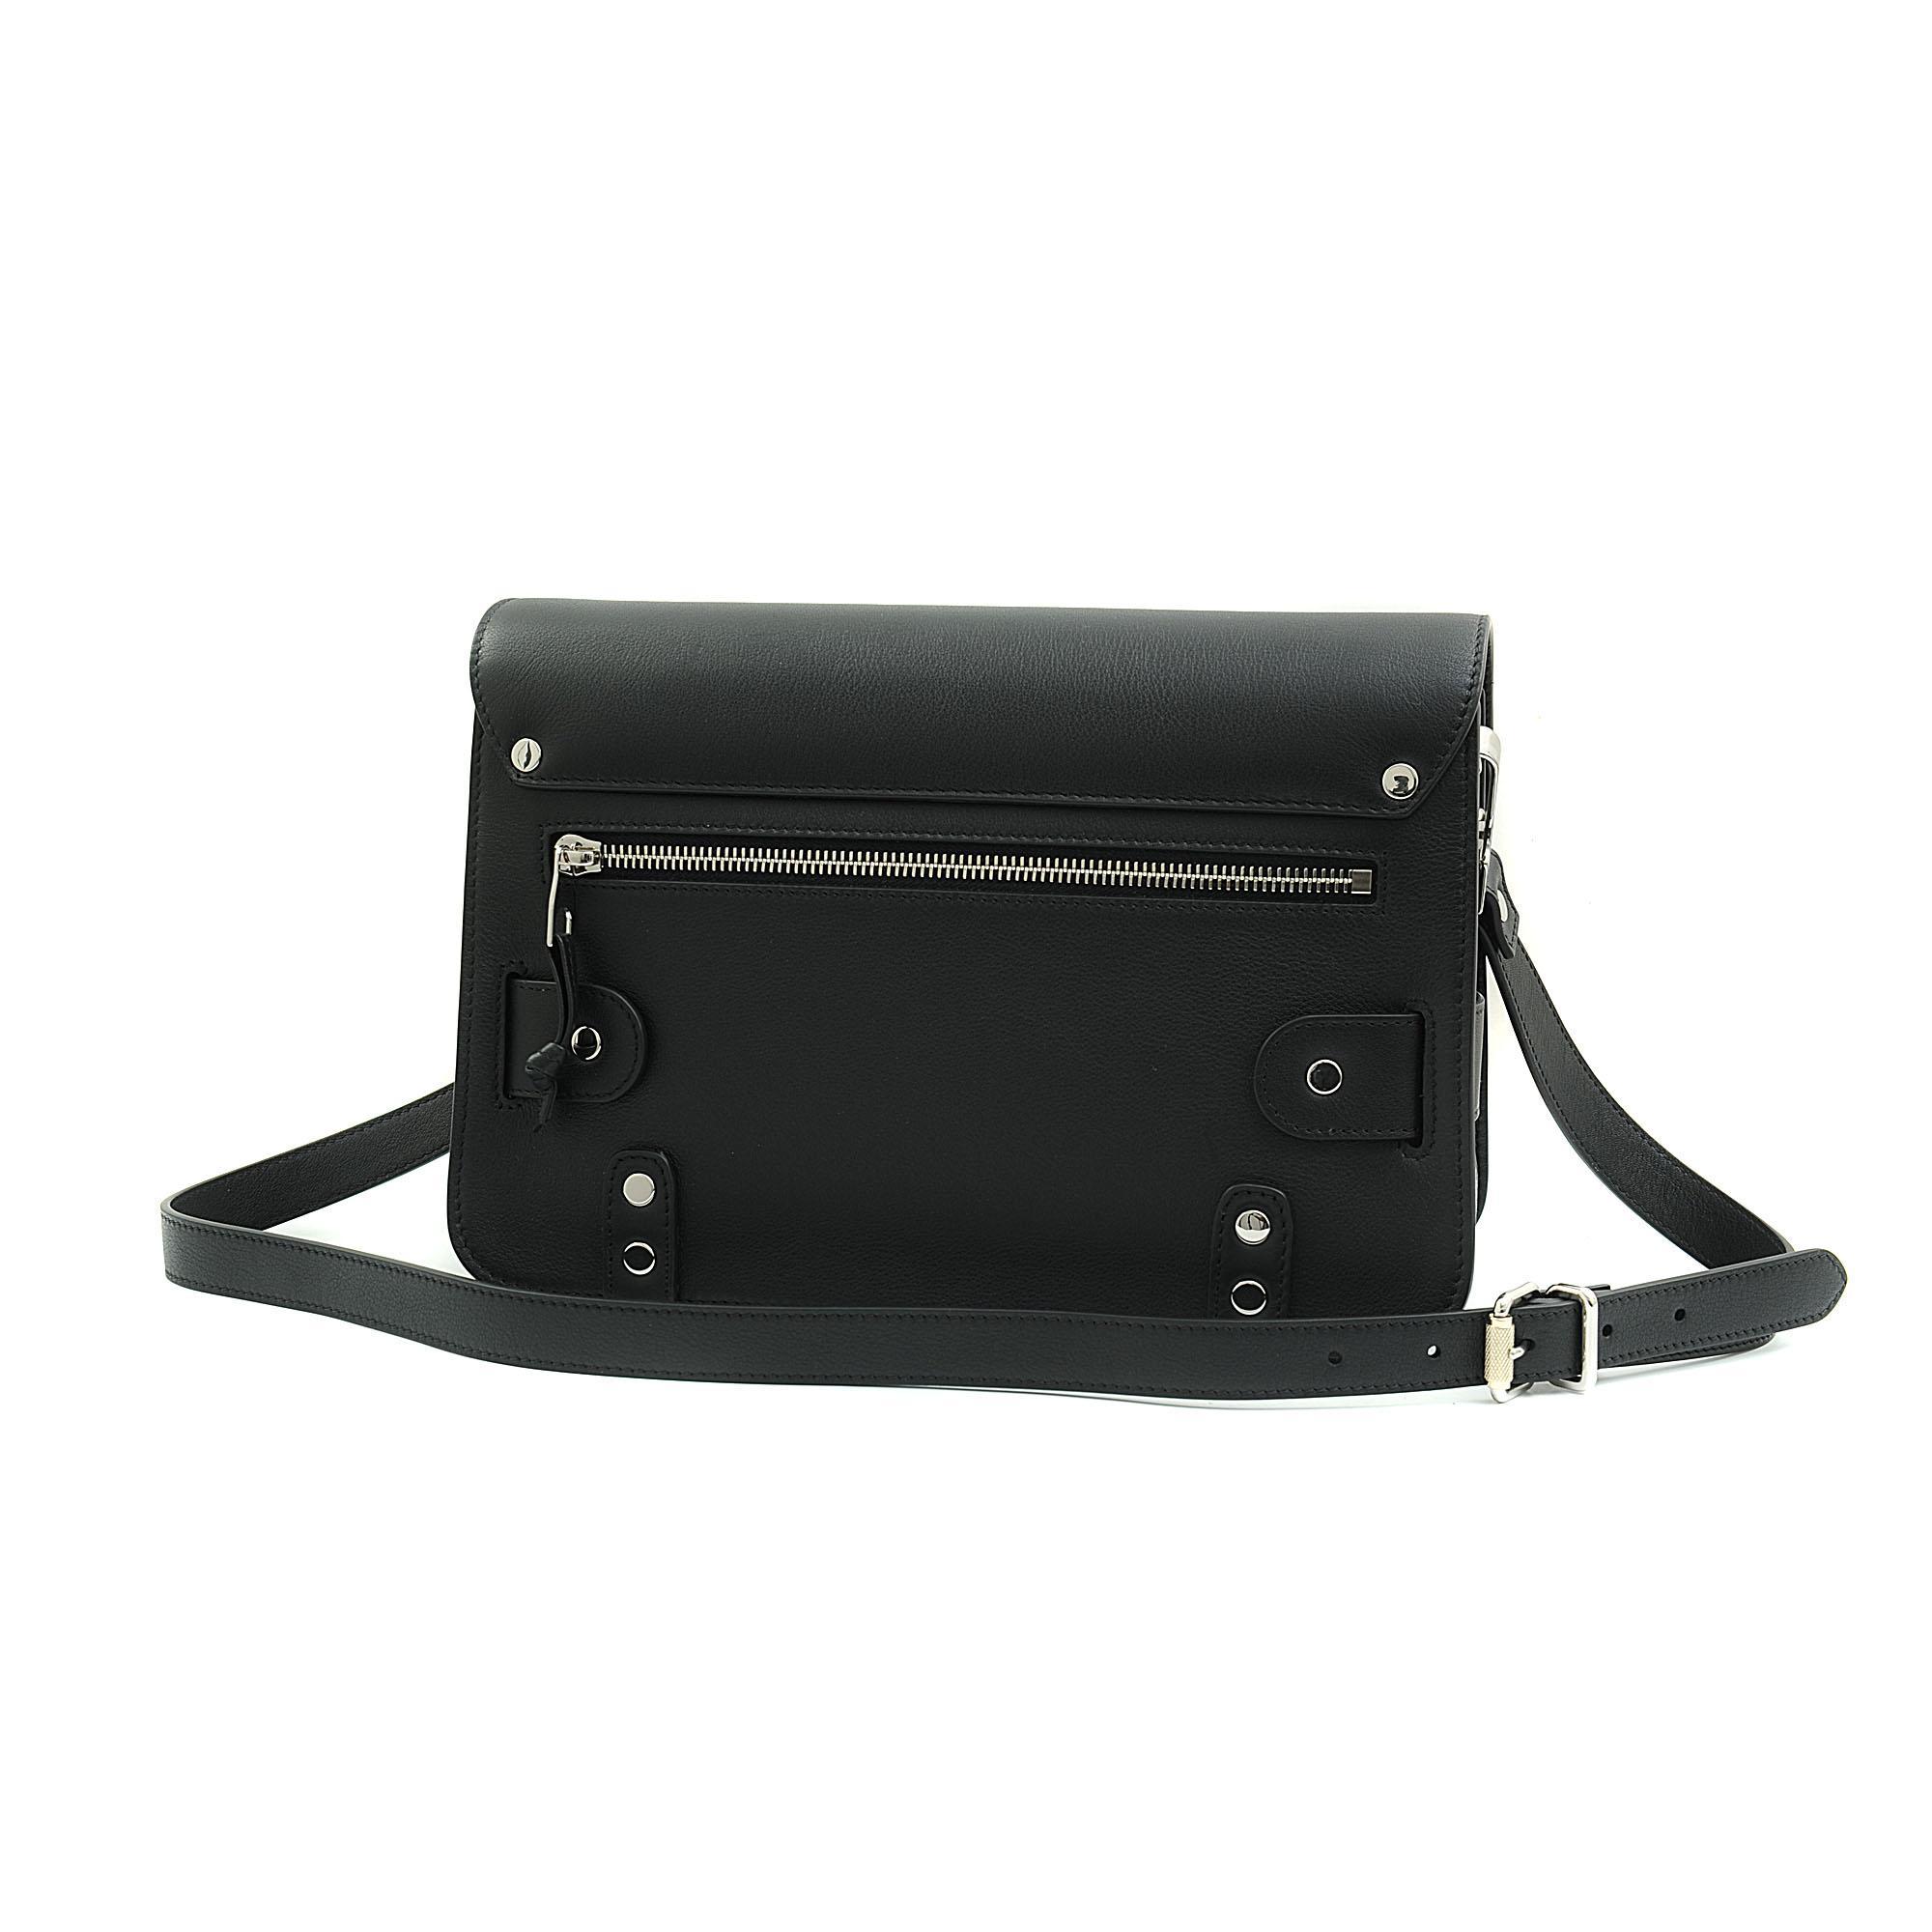 951eddaaeb Luxury designer handbags eshop for women - MONNIER Frères